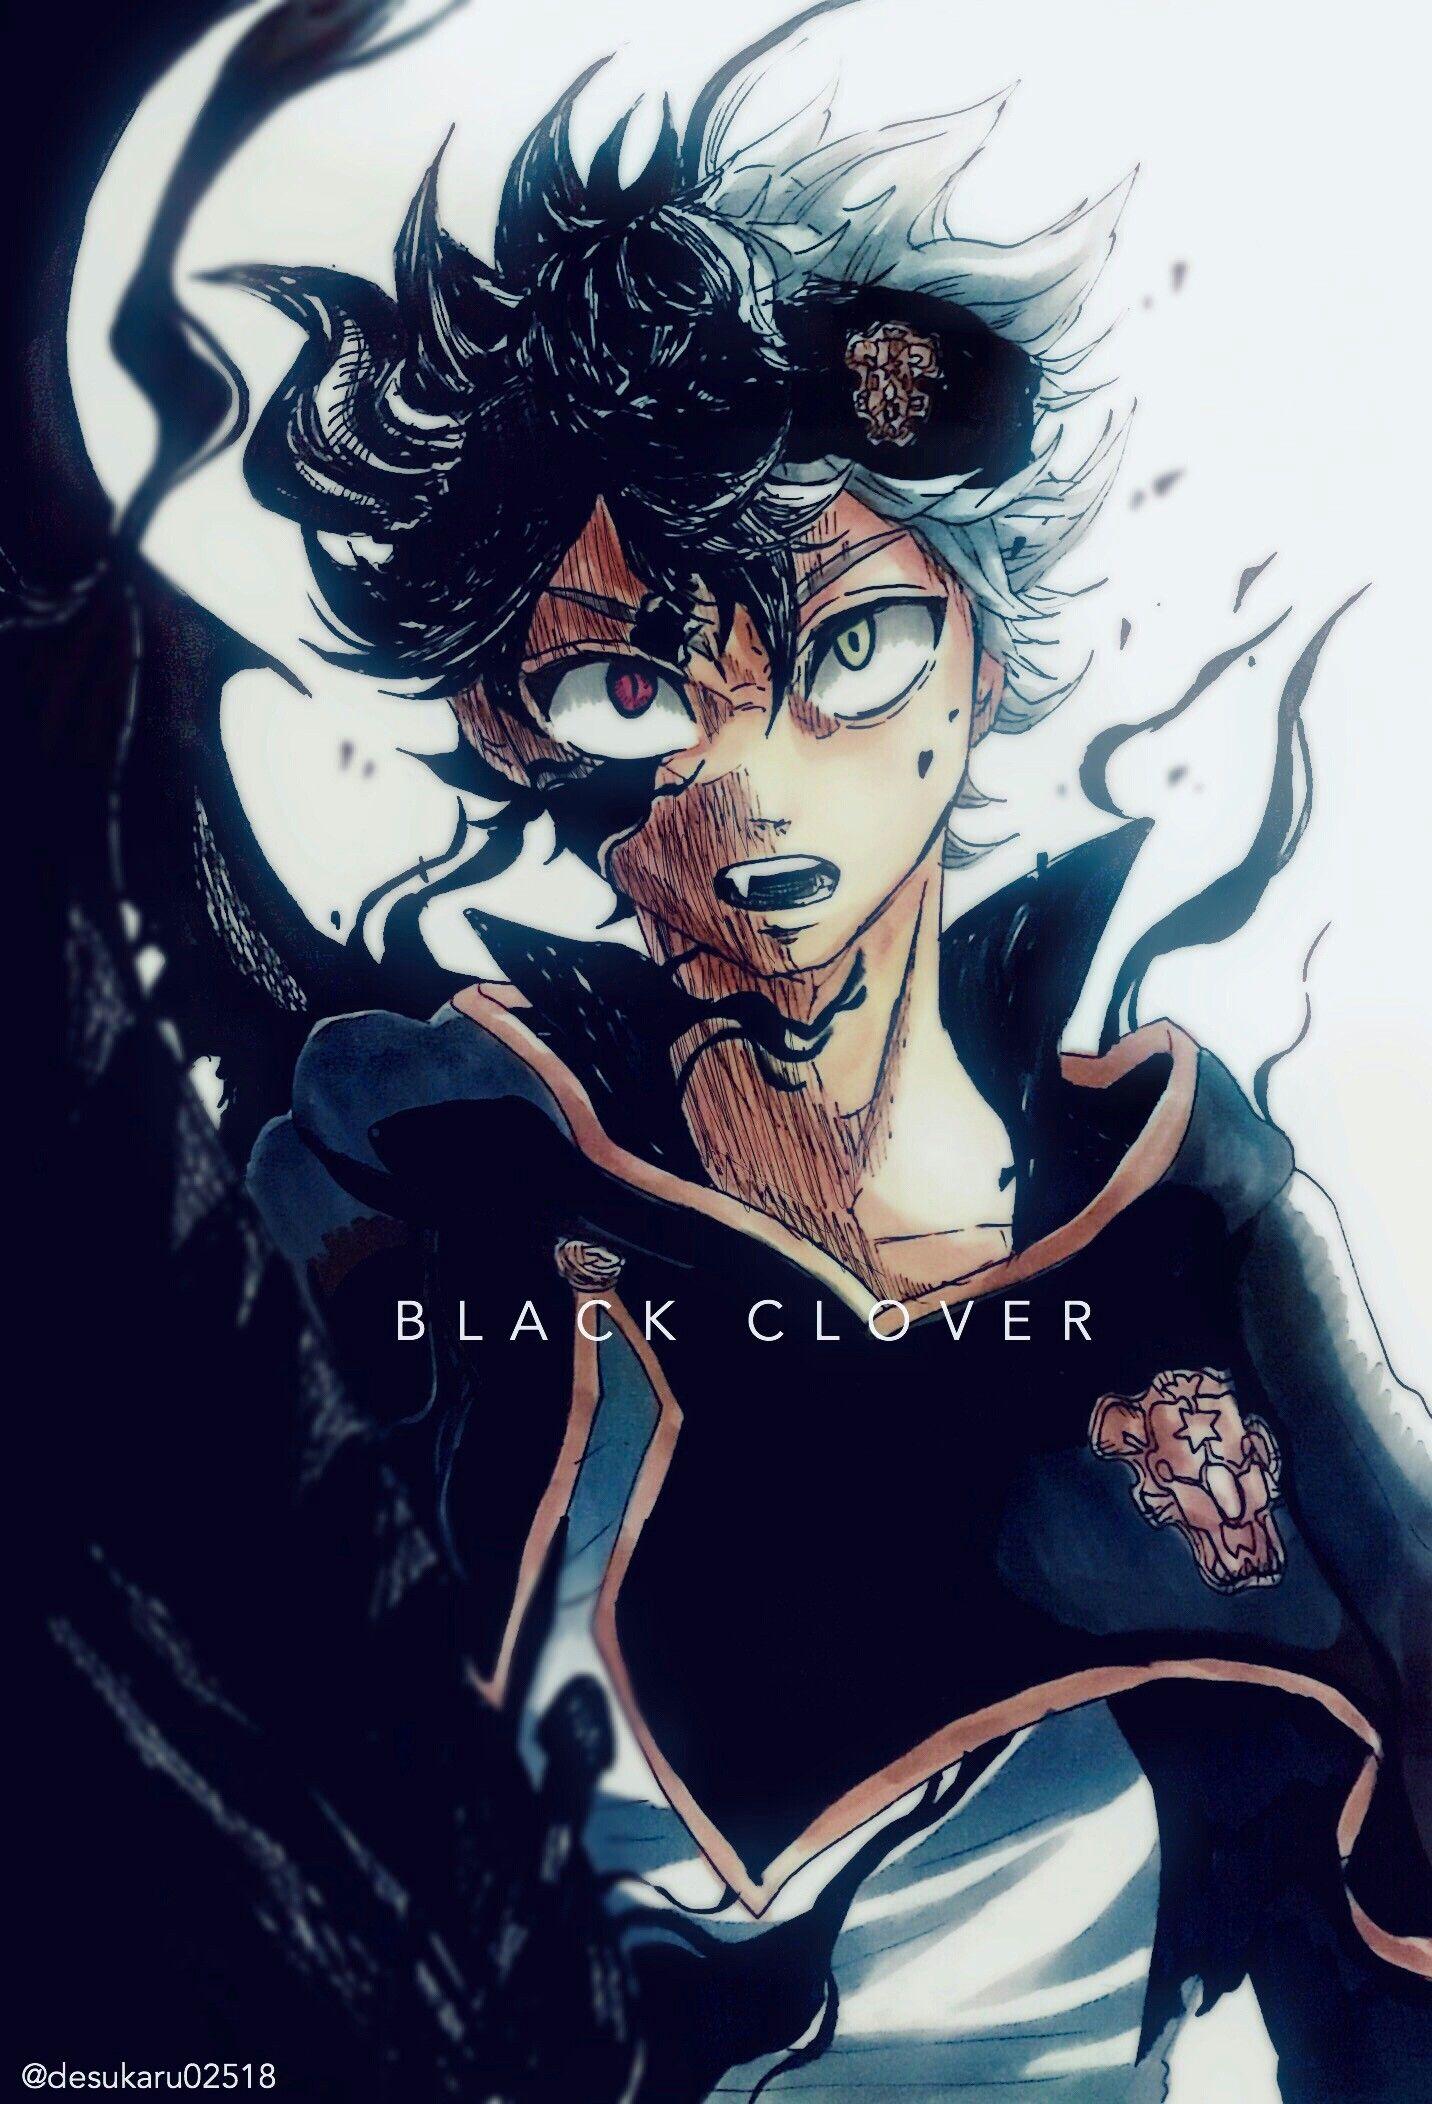 Asta from Black Clover BLACK CLOVER Black clover manga Black 1432x2104